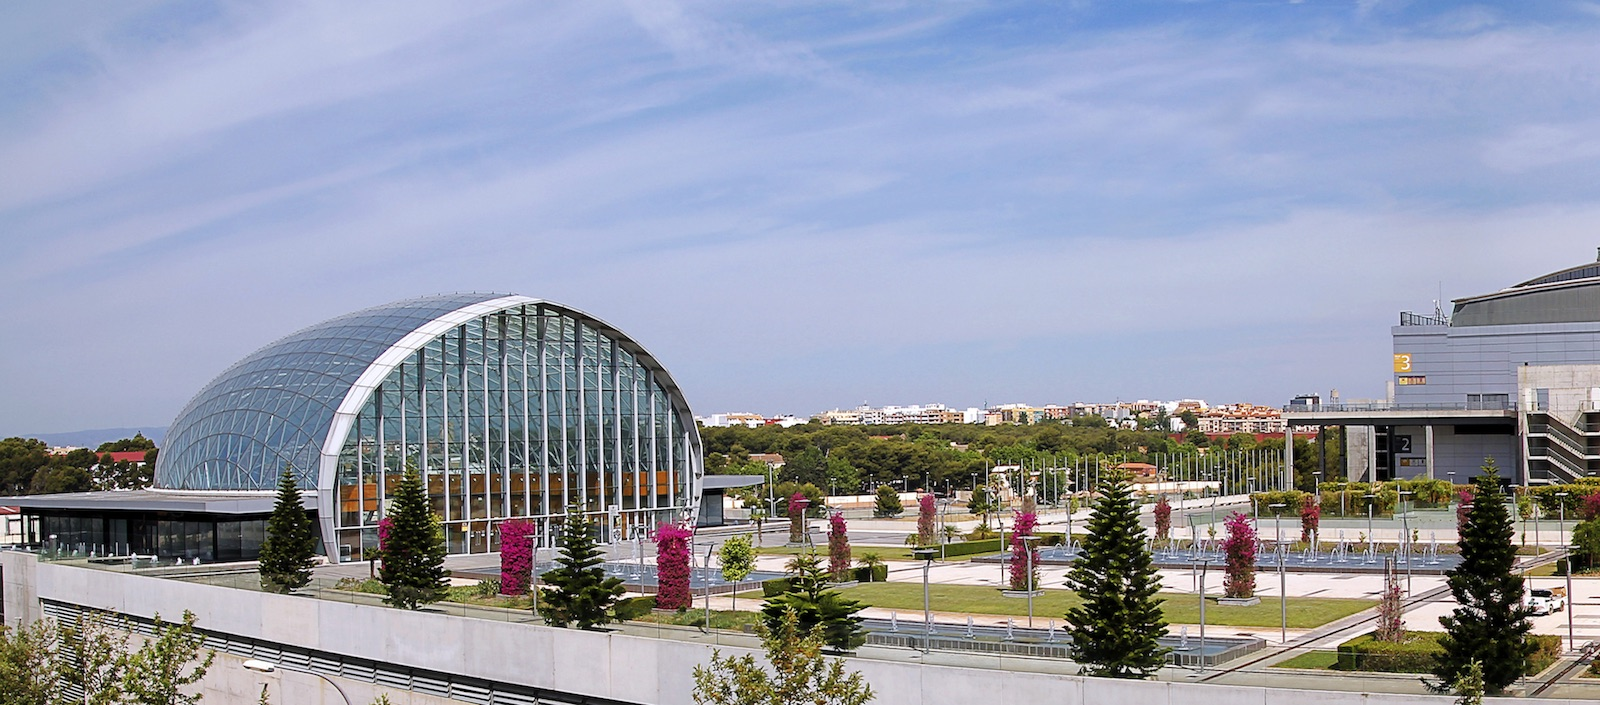 Eventos de febrero 2018 en Feria Valencia 1